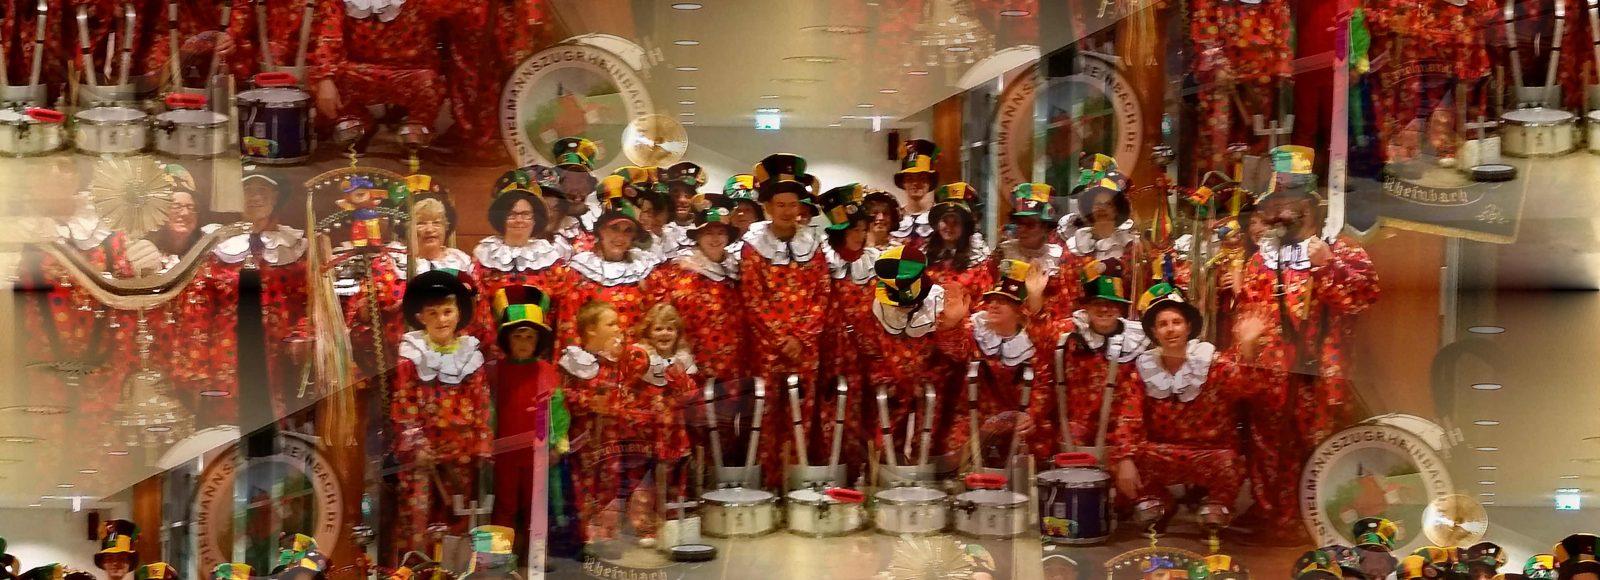 spielmannszug-karneval